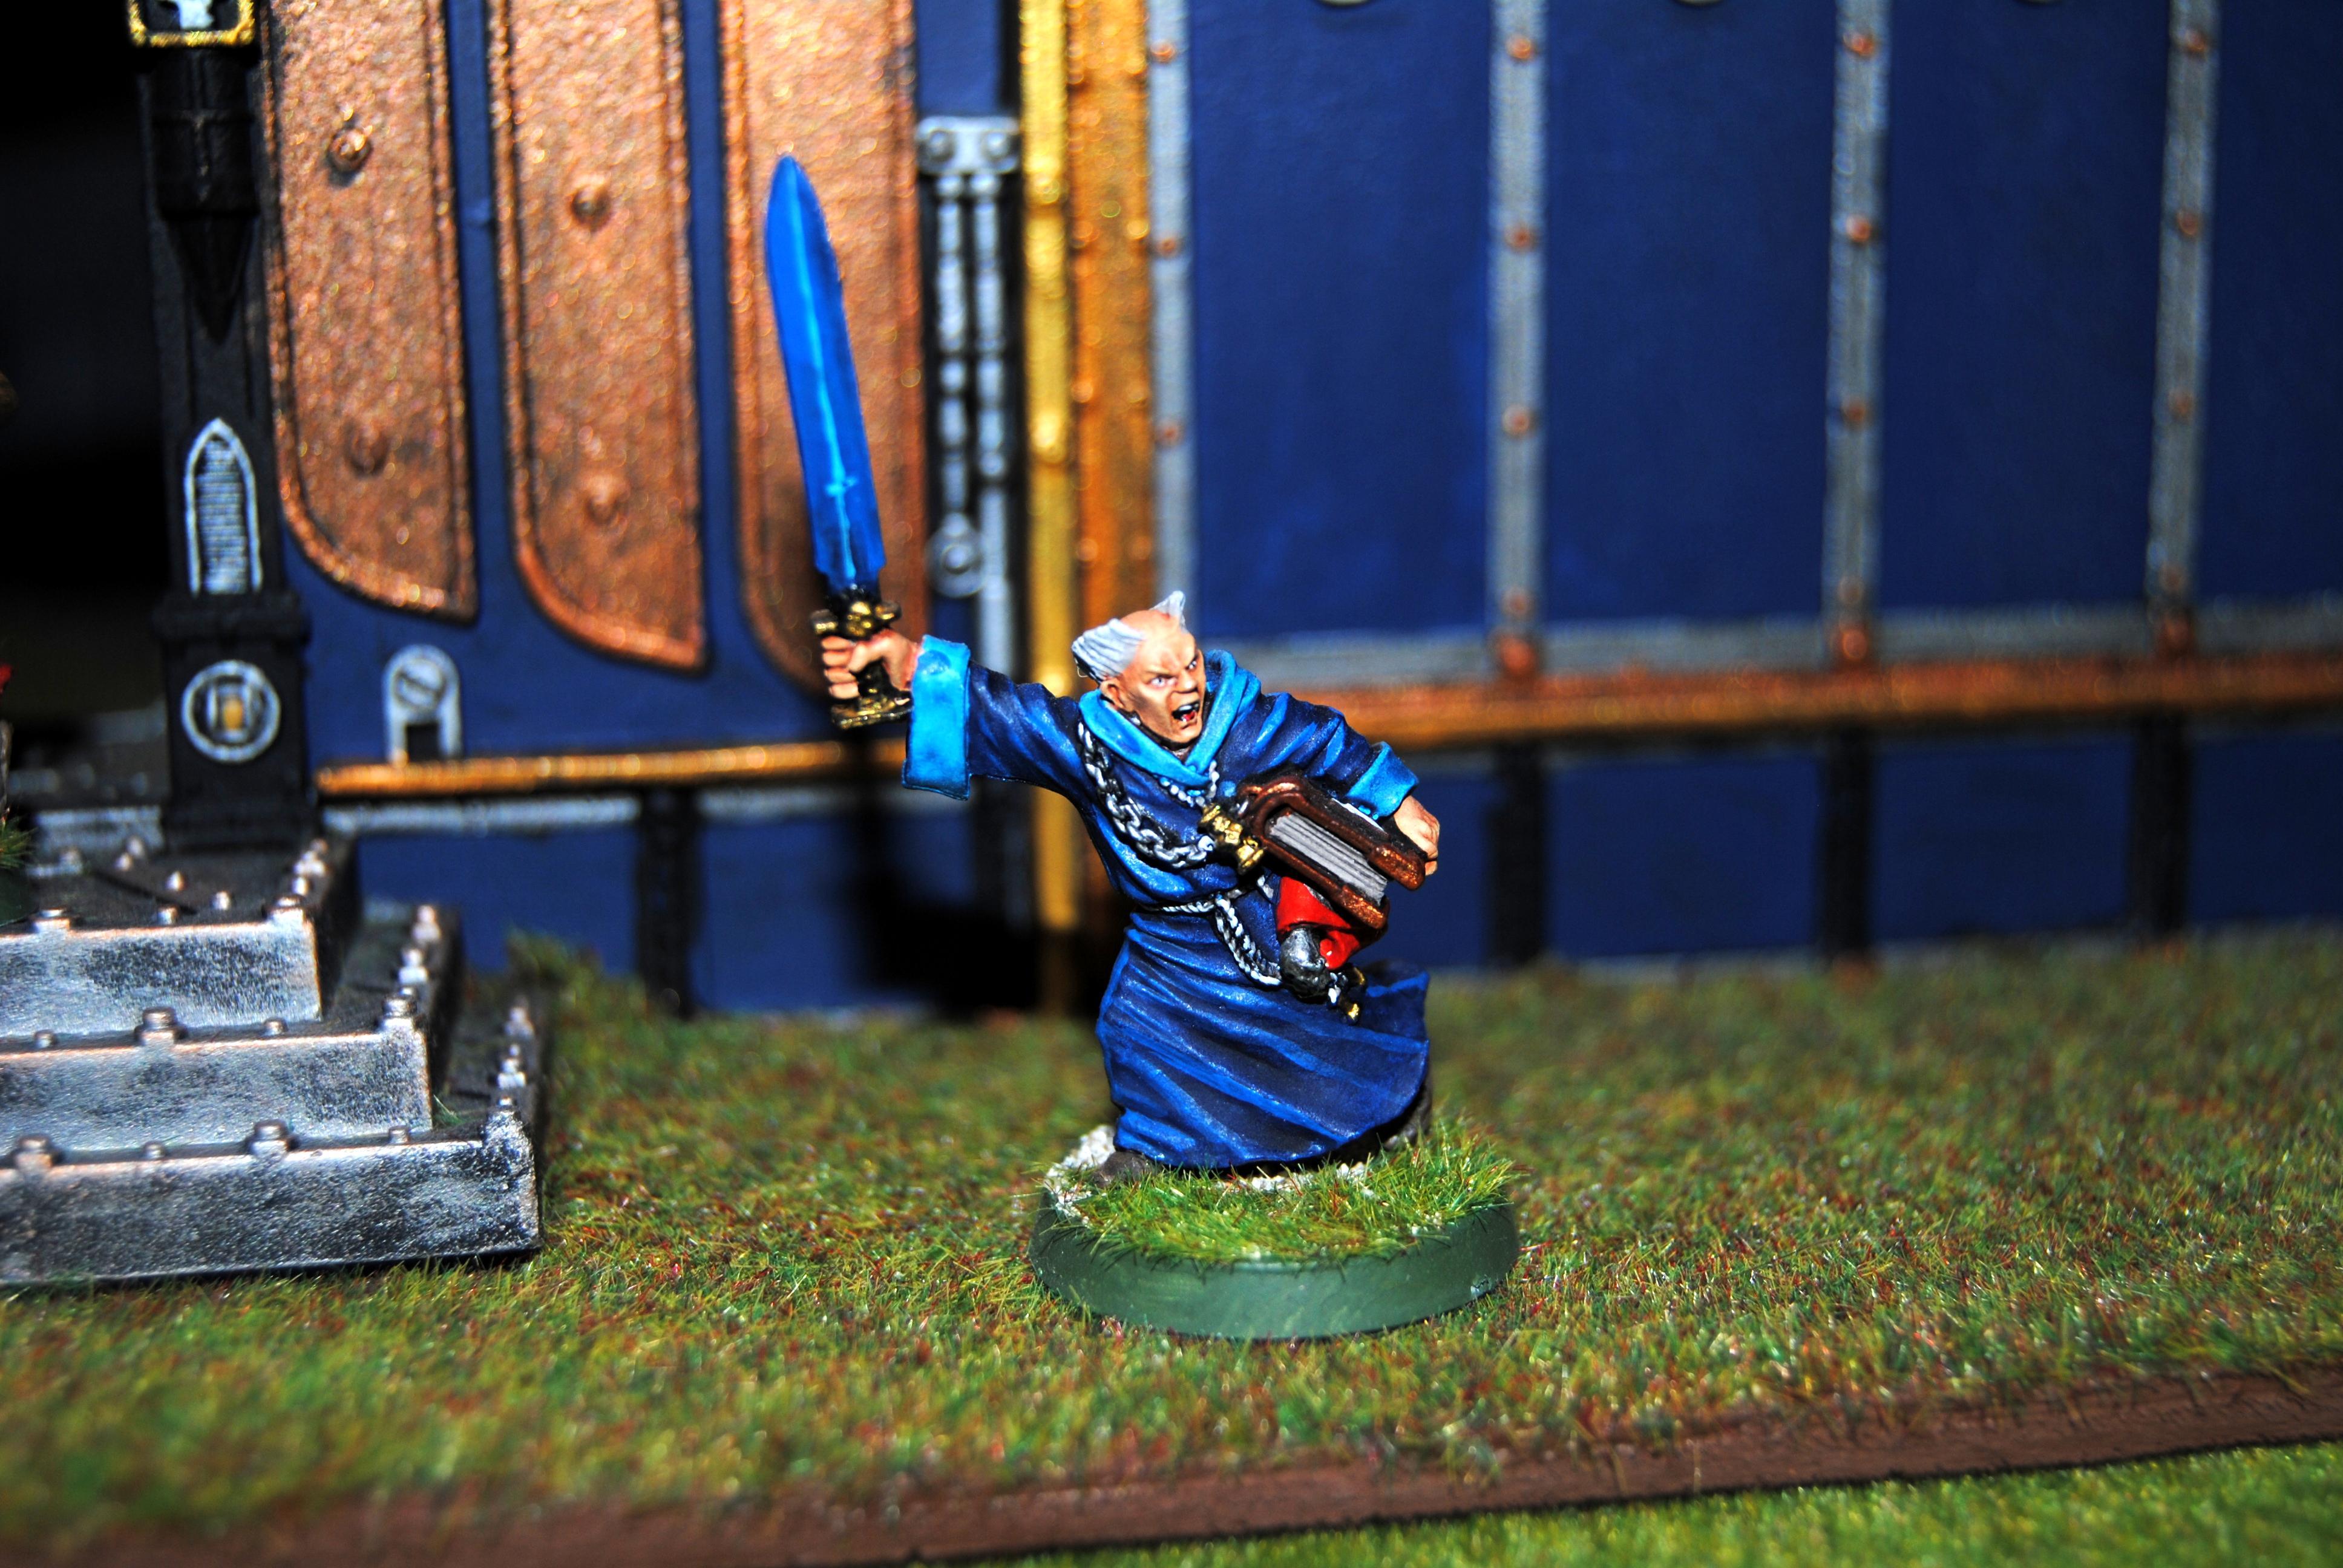 Adepta Sororitas, Power Sword, Priest